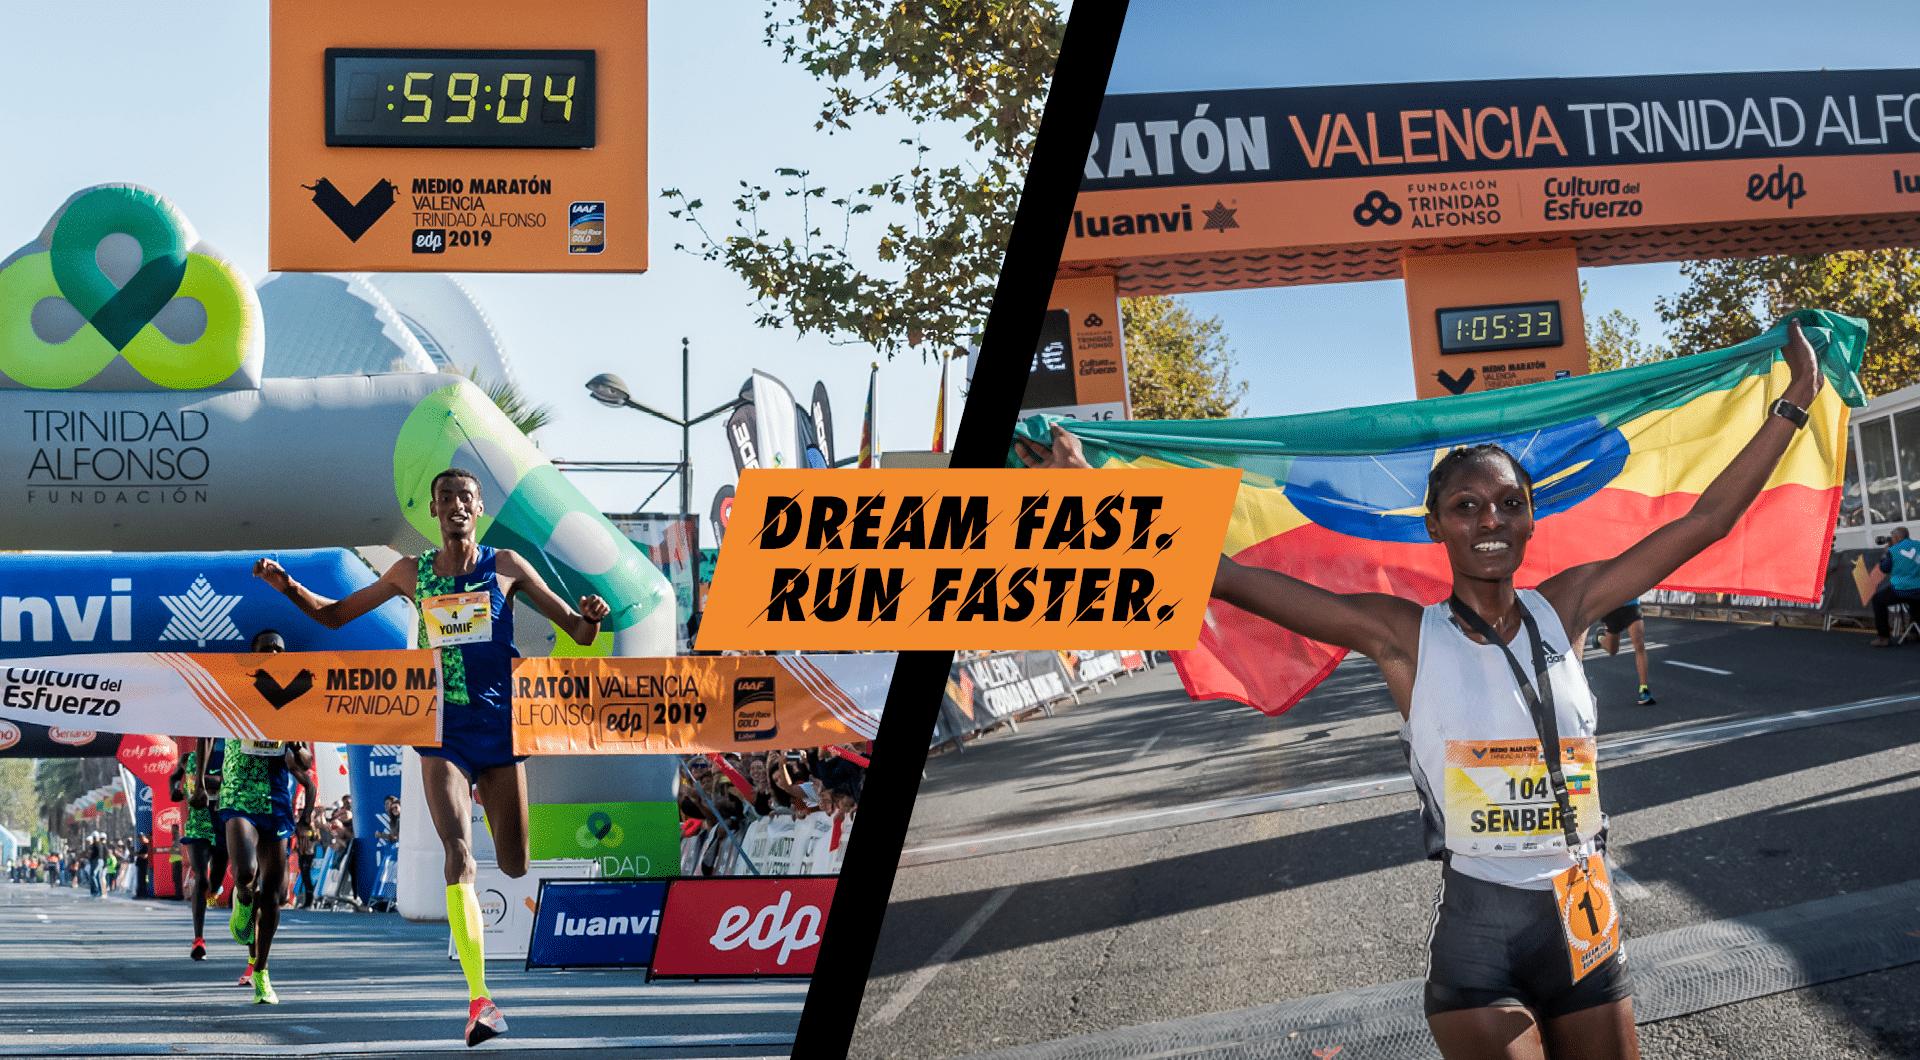 Ganadores Medio Maratón Valencia 2019